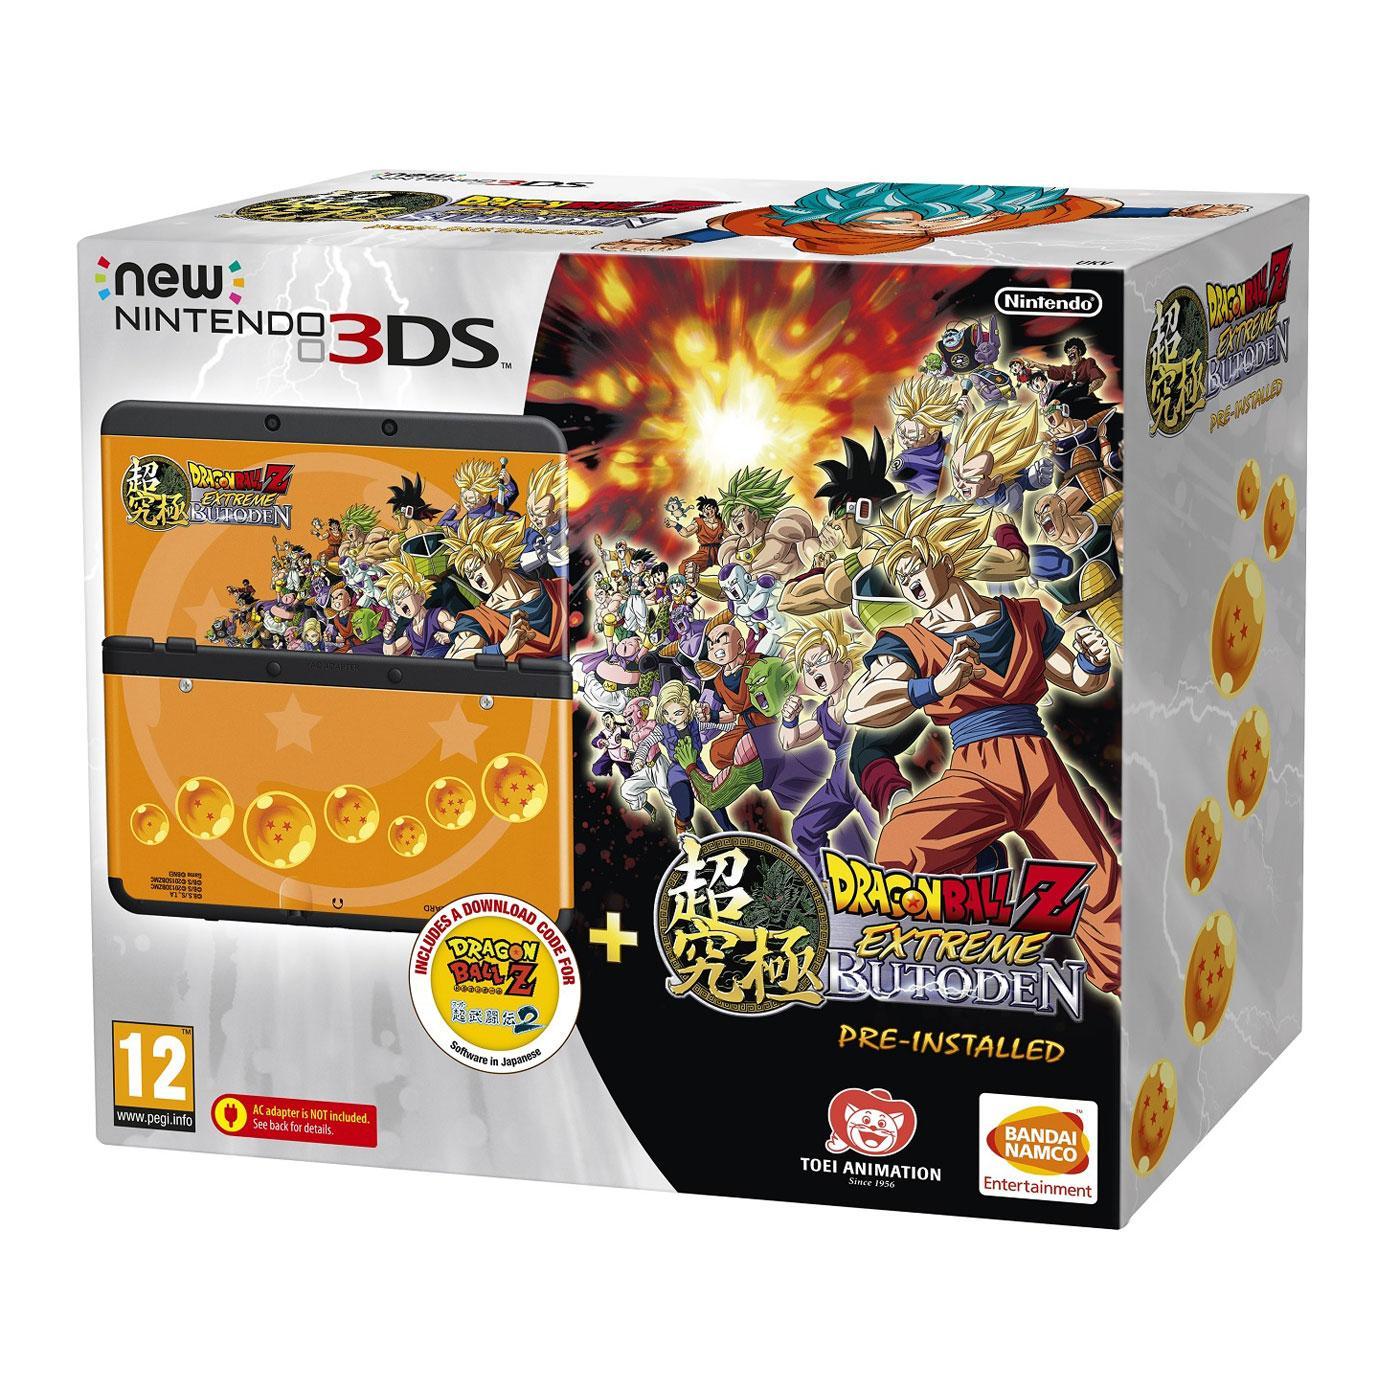 Console Nintendo New 3DS + DBZ + Bravely Defaut + Pokemon X + Pochette Pokemon X/Y